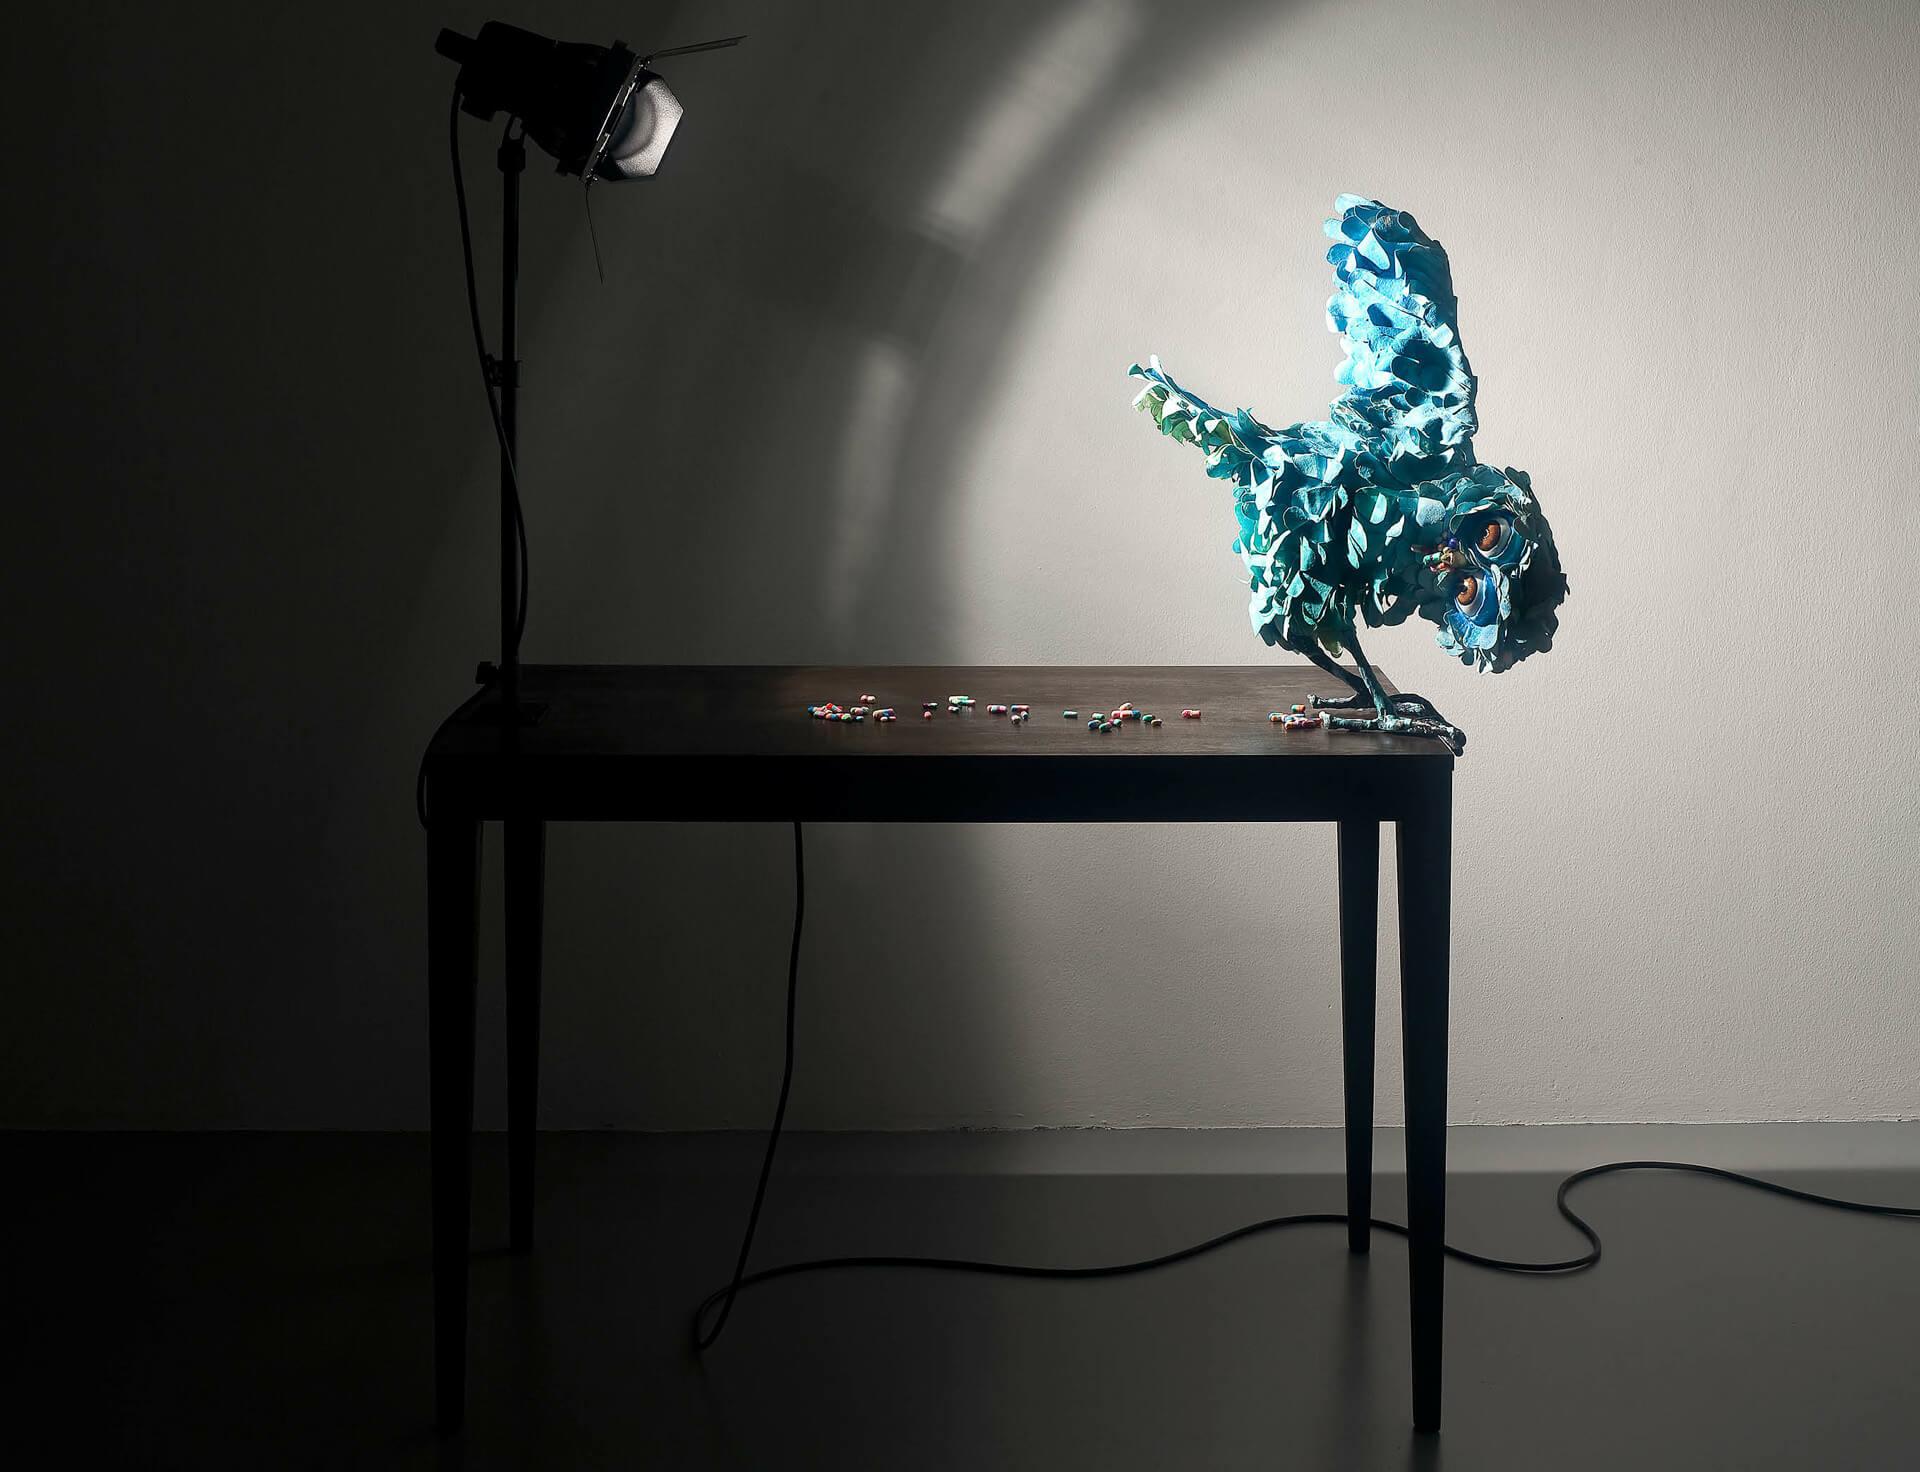 Djurberg & Berg at 'Encounters', Art Basel in Hong Kong